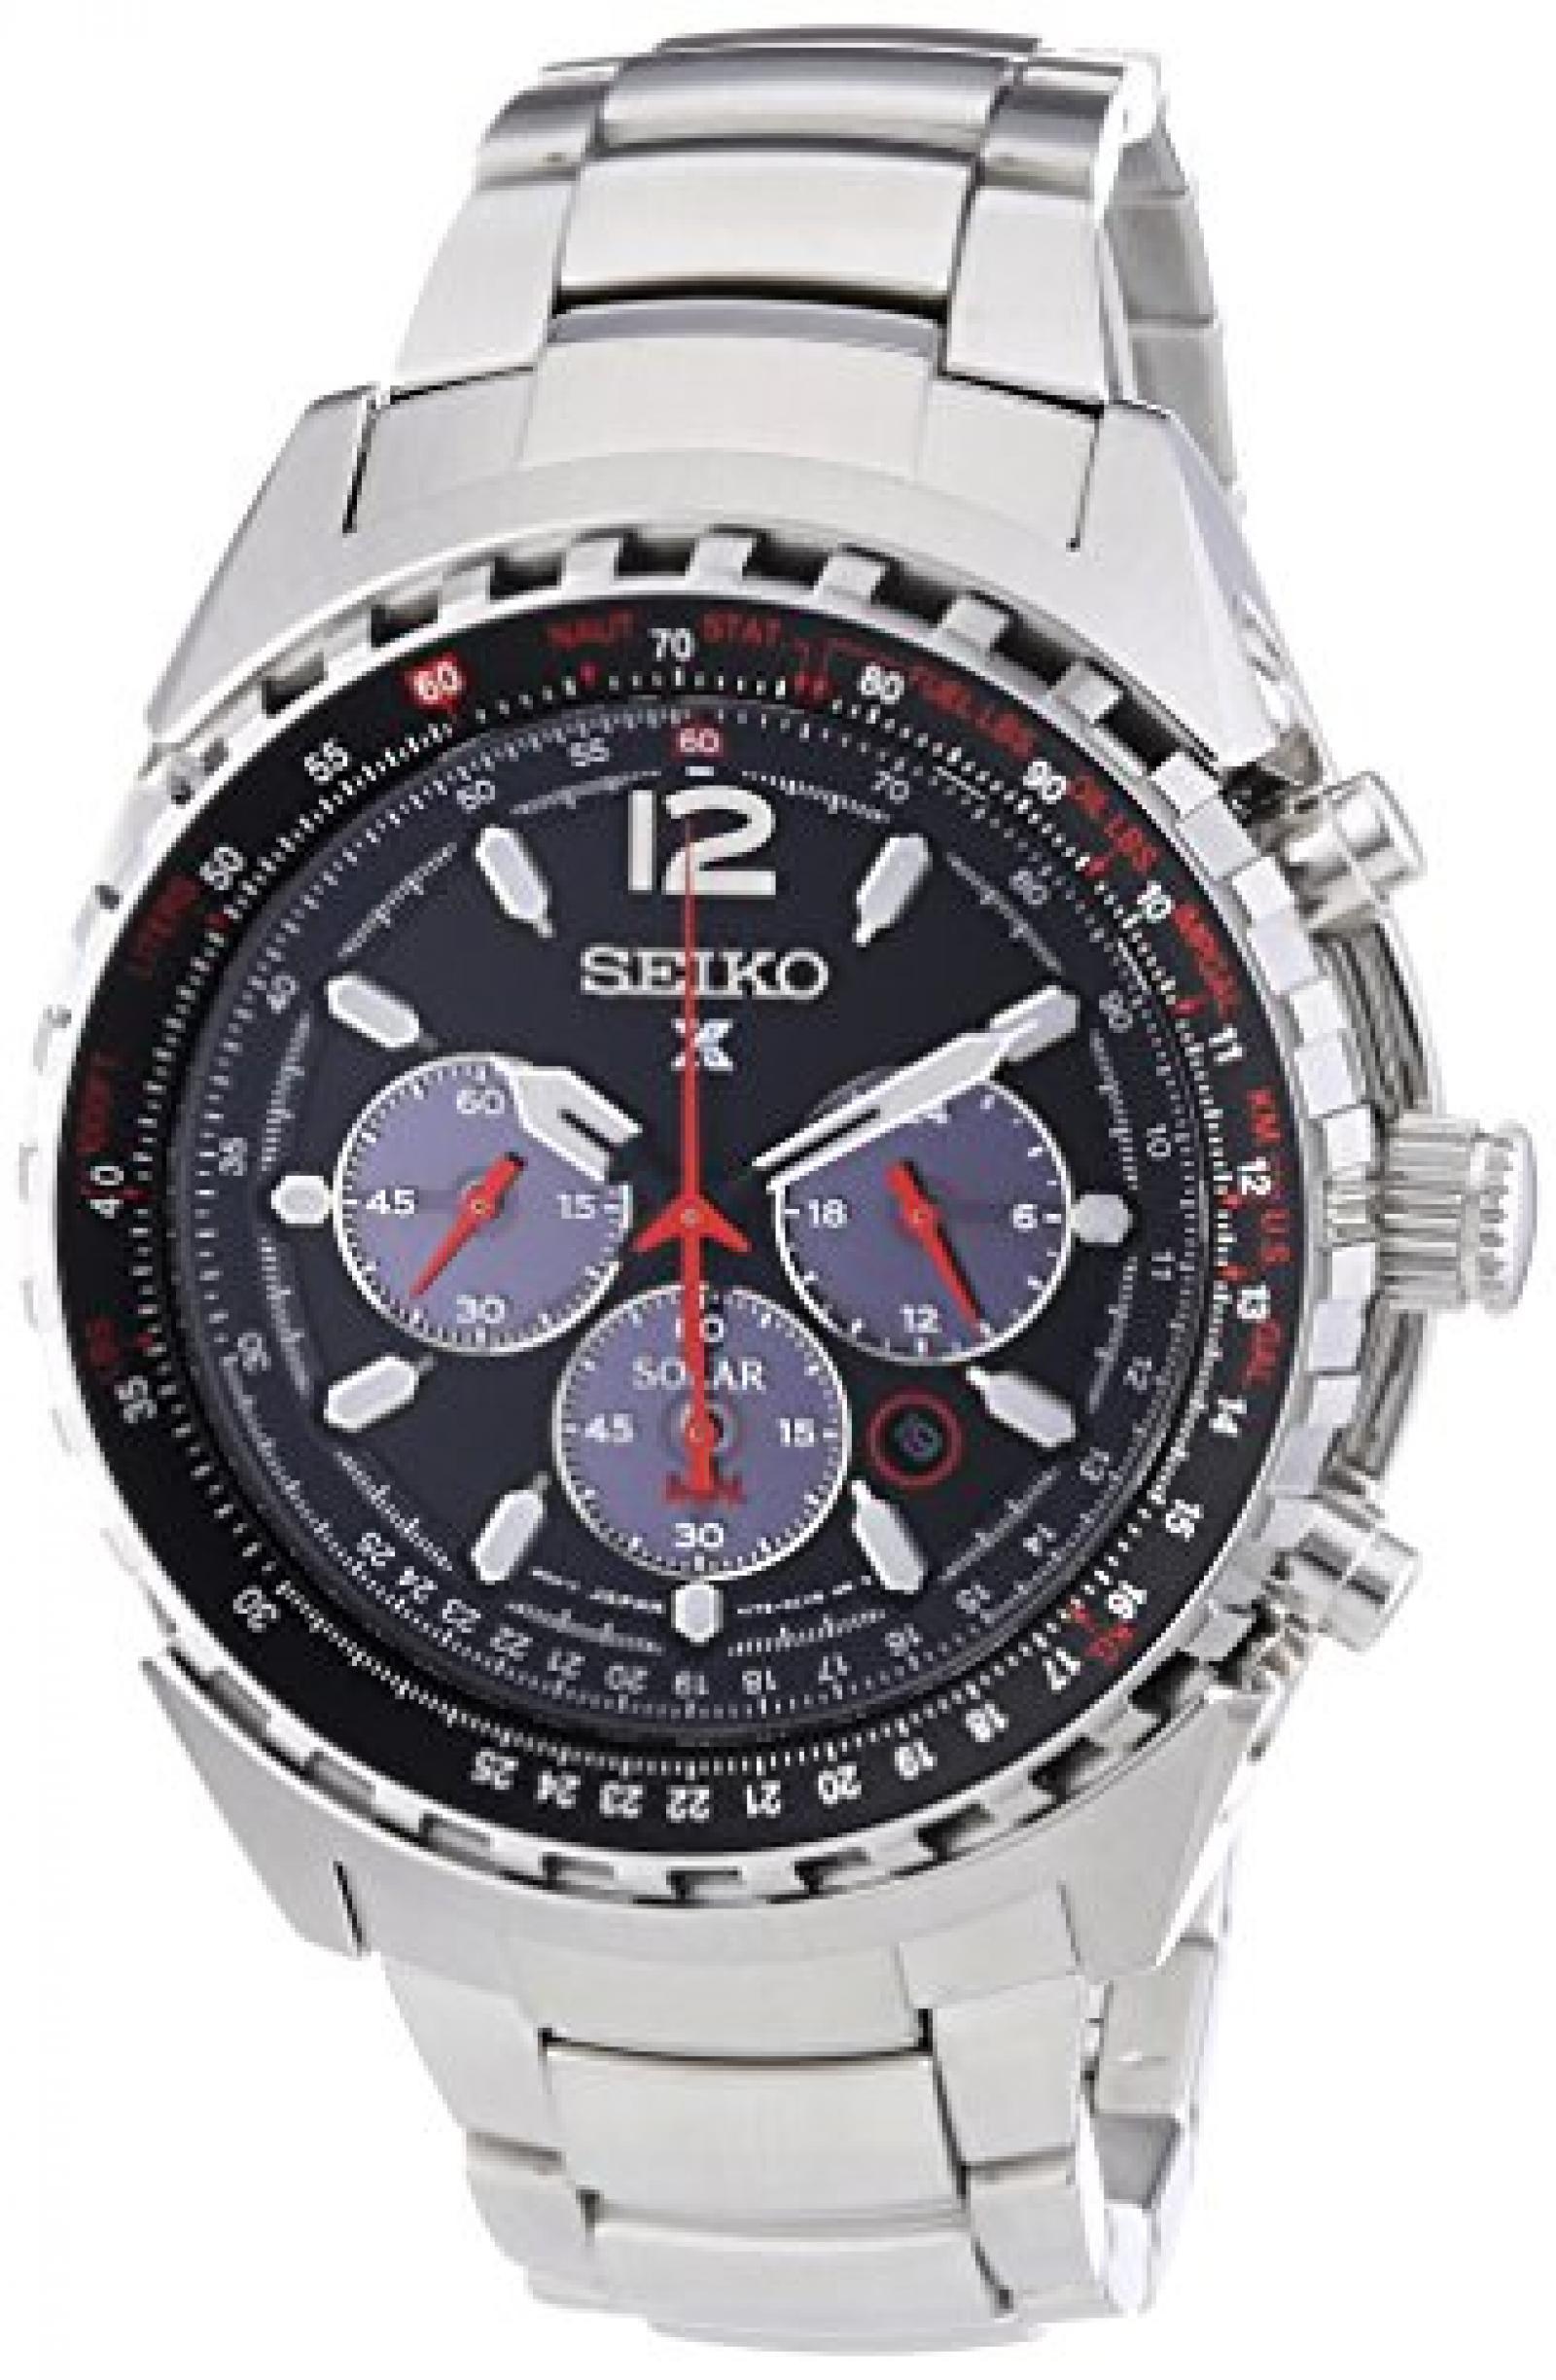 Seiko Herren-Armbanduhr XL Aviaton Solar Chronograph Quarz Edelstahl SSC261P1